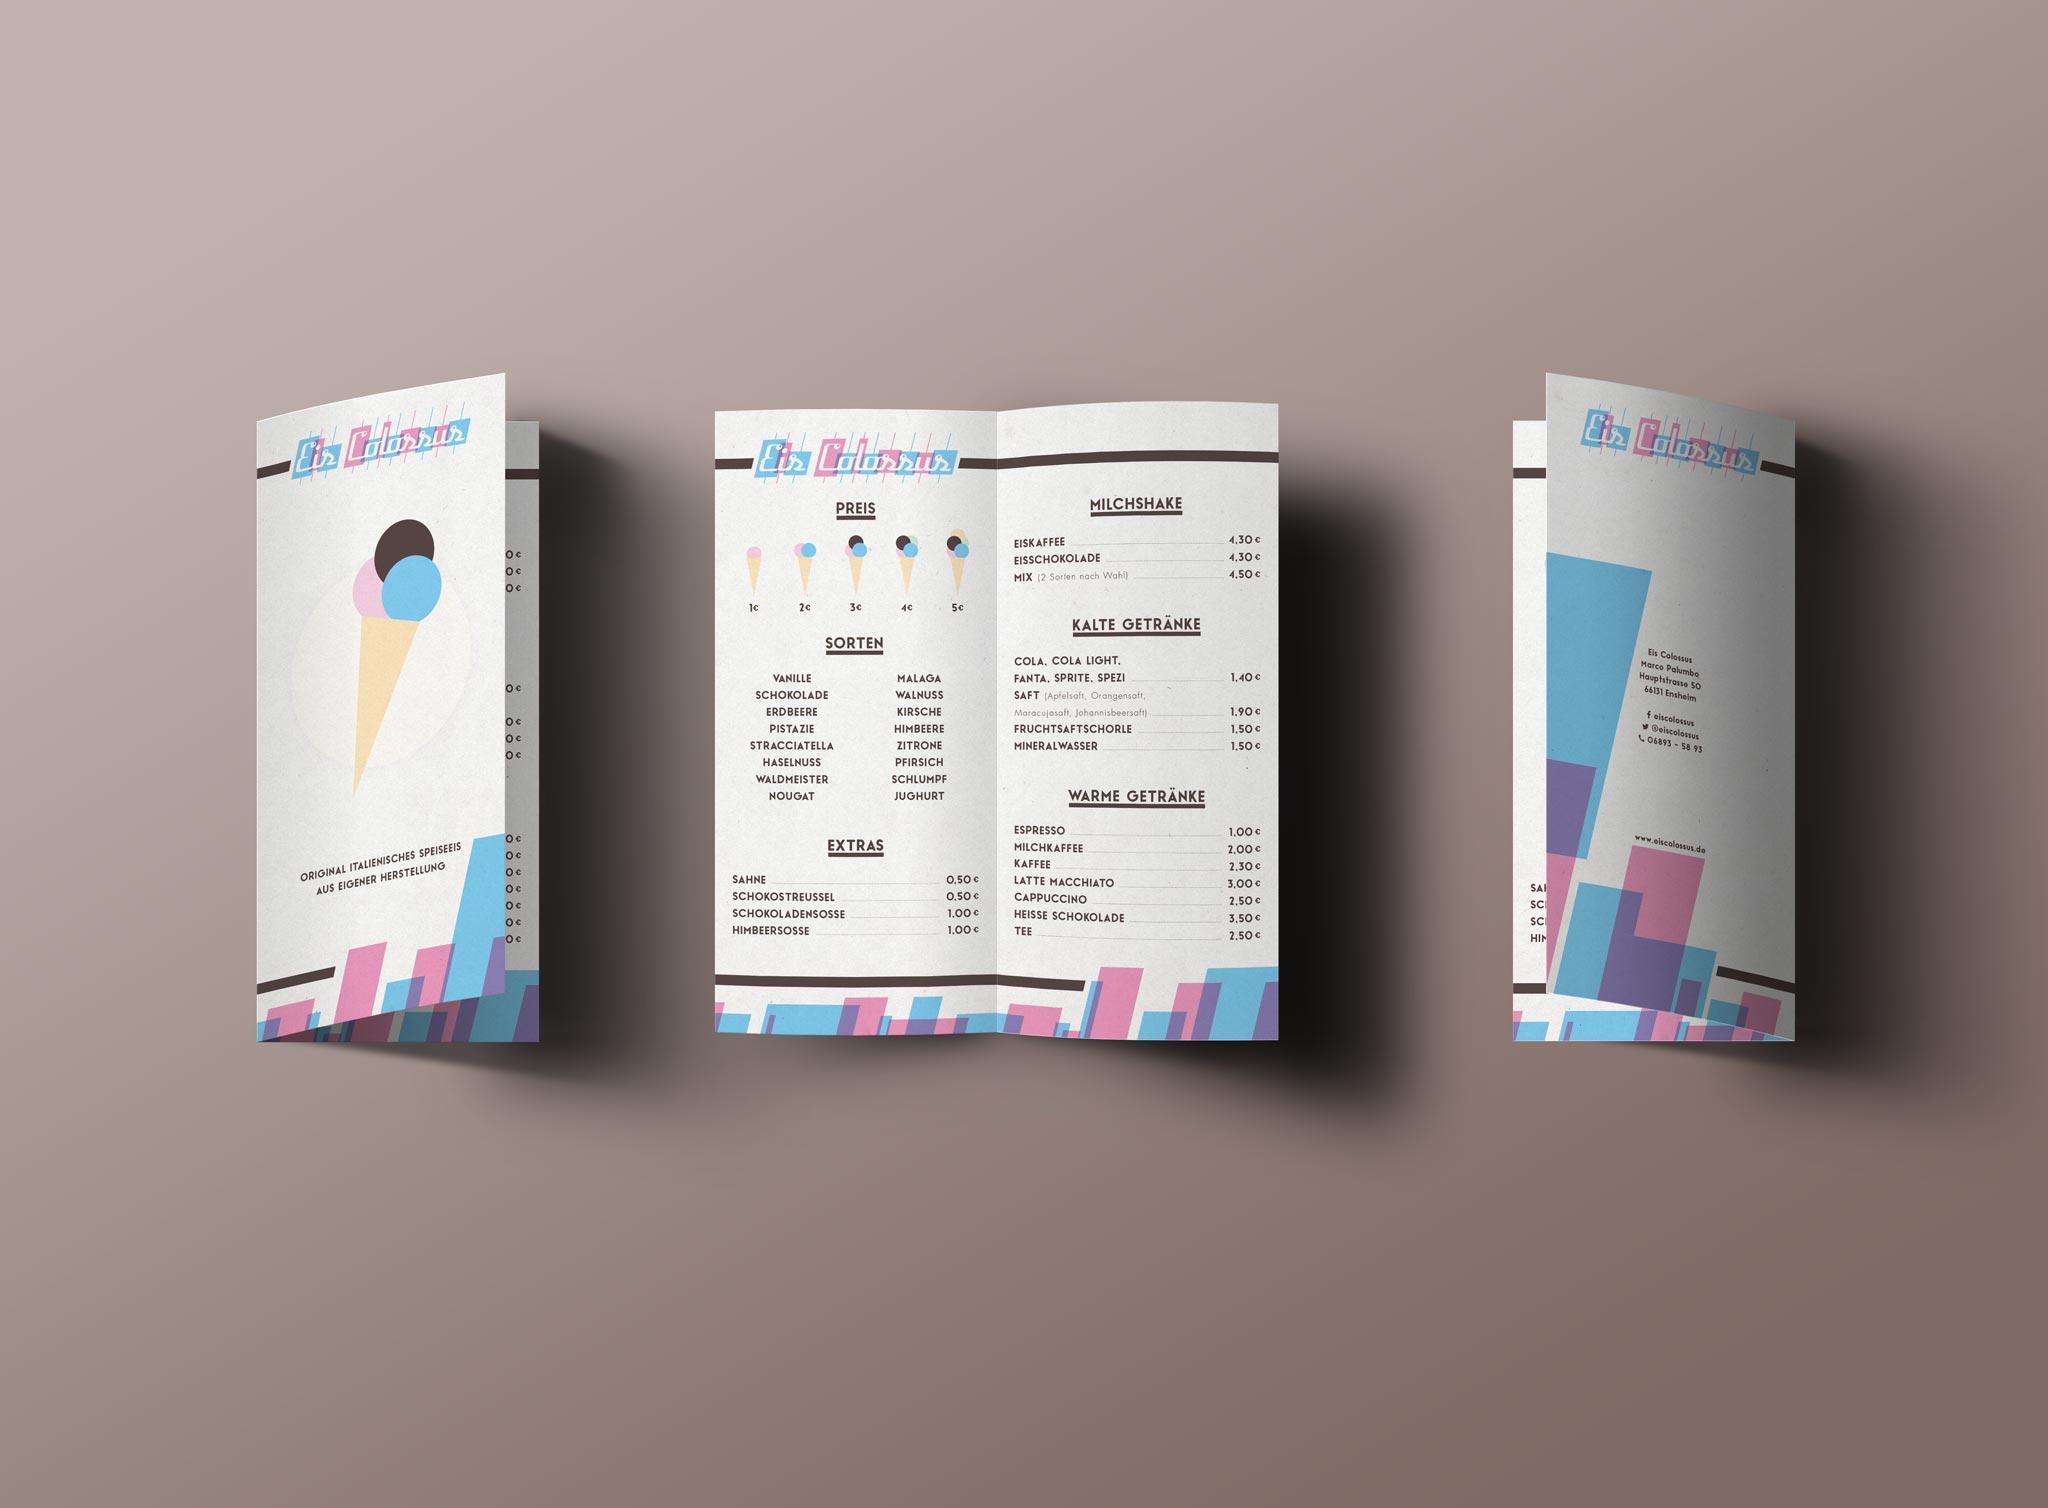 Eis Colossus Corporate Design Eiskarte Menukarte Gesa Siebert Kommunikationsdesign